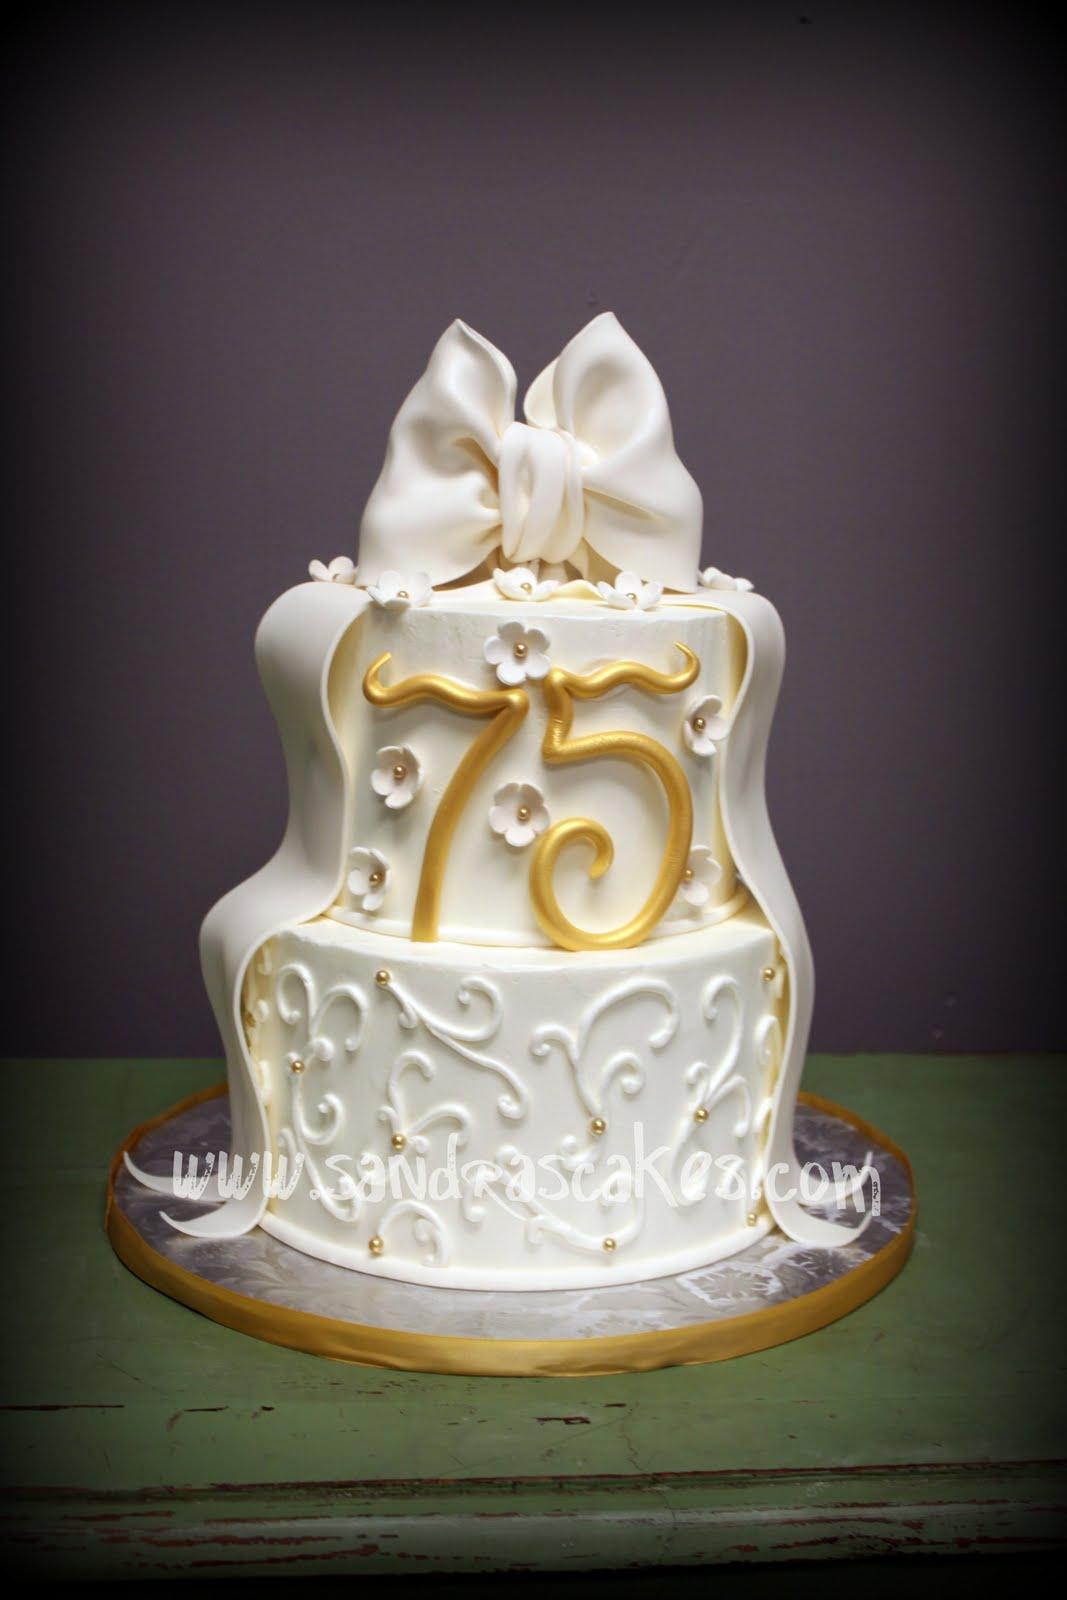 On Birthday Cakes Birthday cakes for grown ups